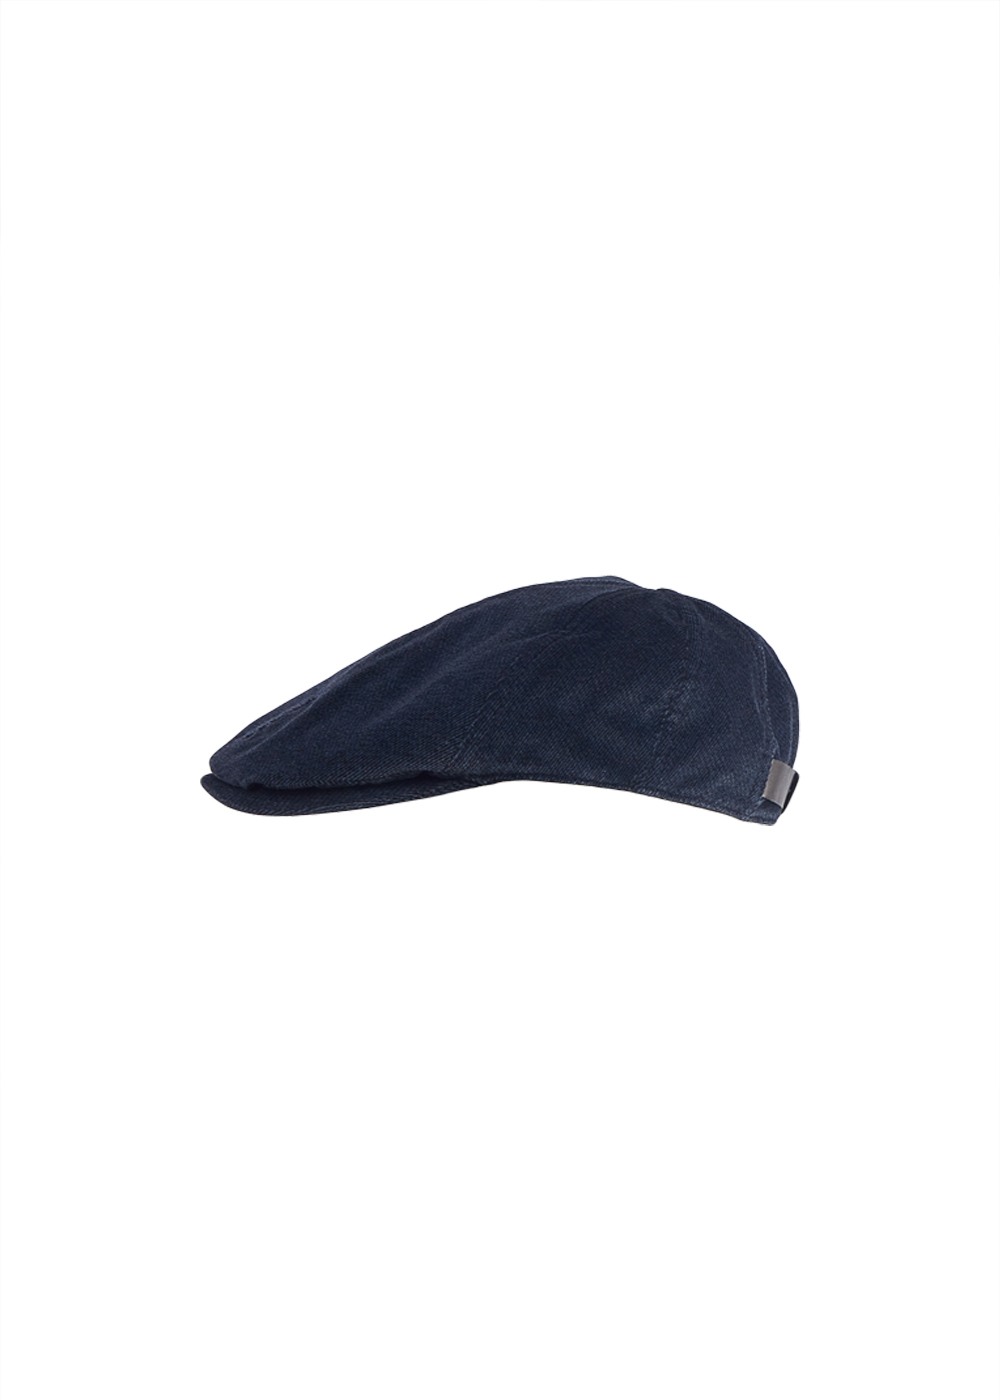 Купить Emporio Armani кепка